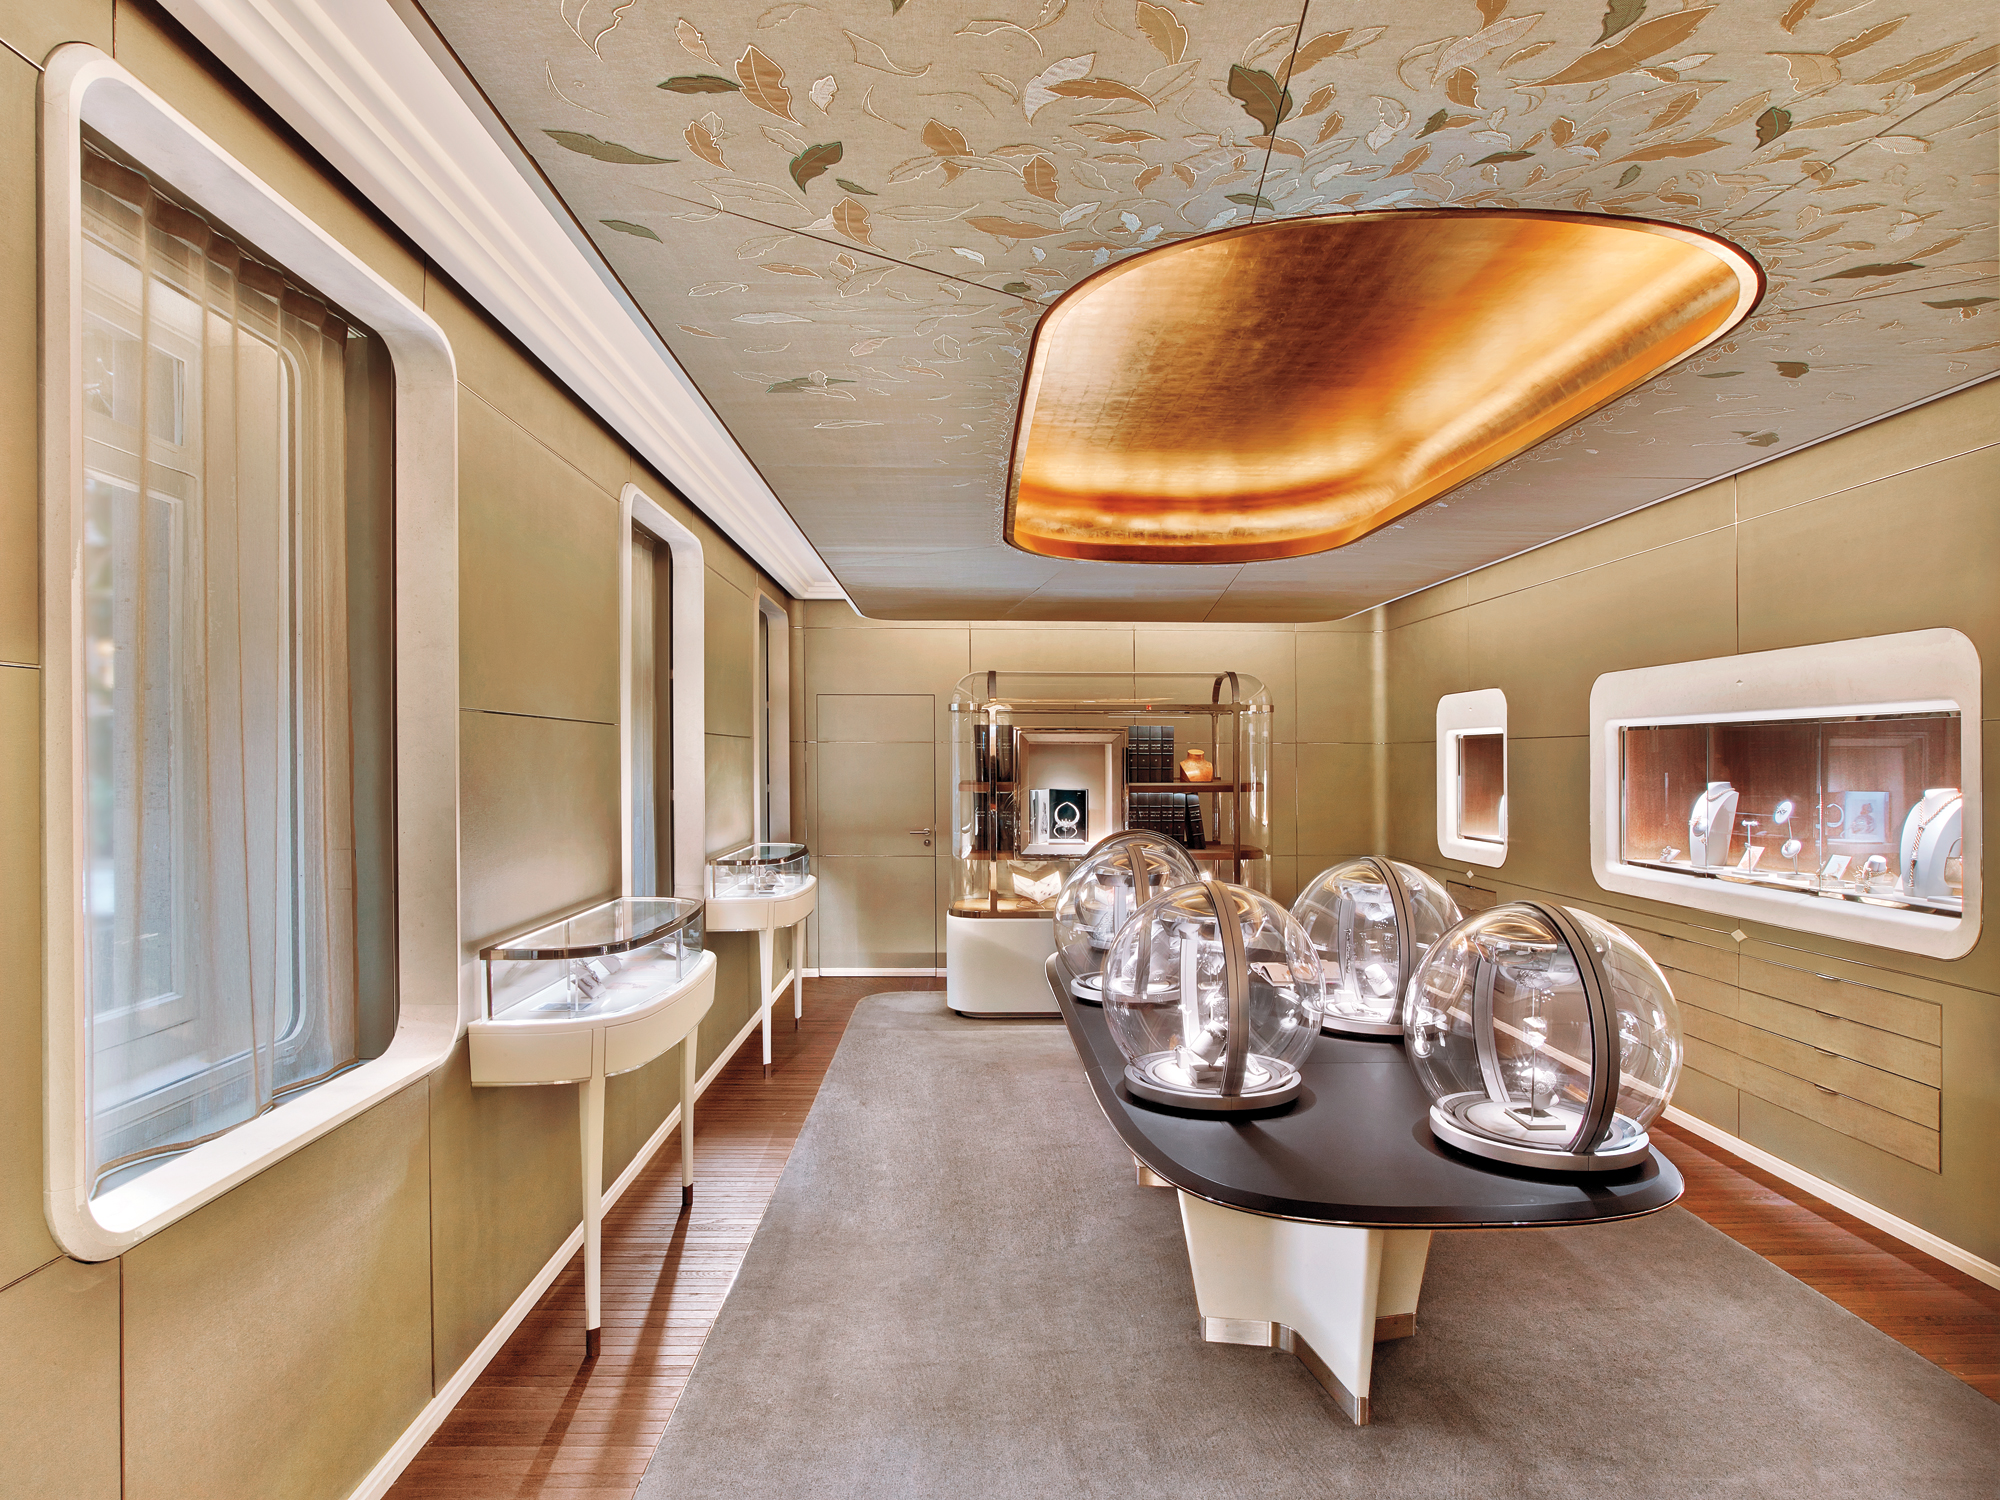 Van cleef arpels by jouin manku 2016 best of year for Design interieur paris